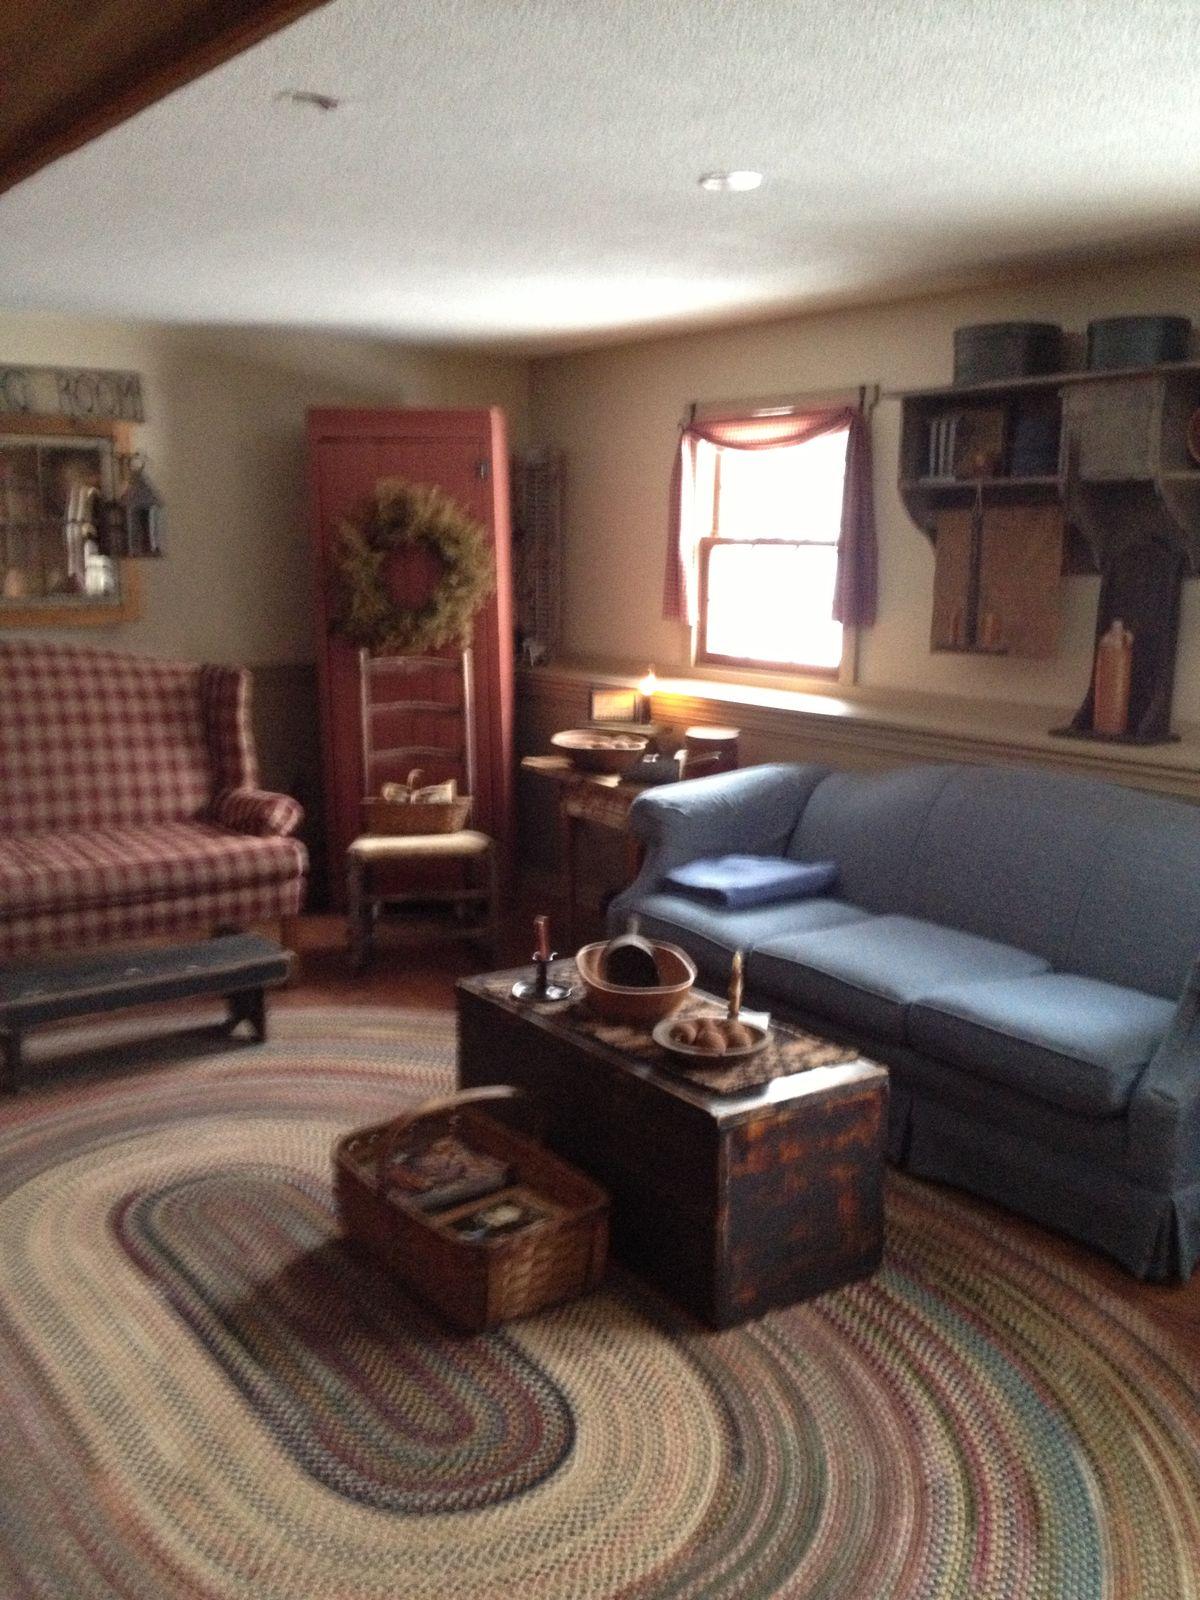 Primitive Living Room Decor: 1000+ Images About Prim Living Rooms On Pinterest